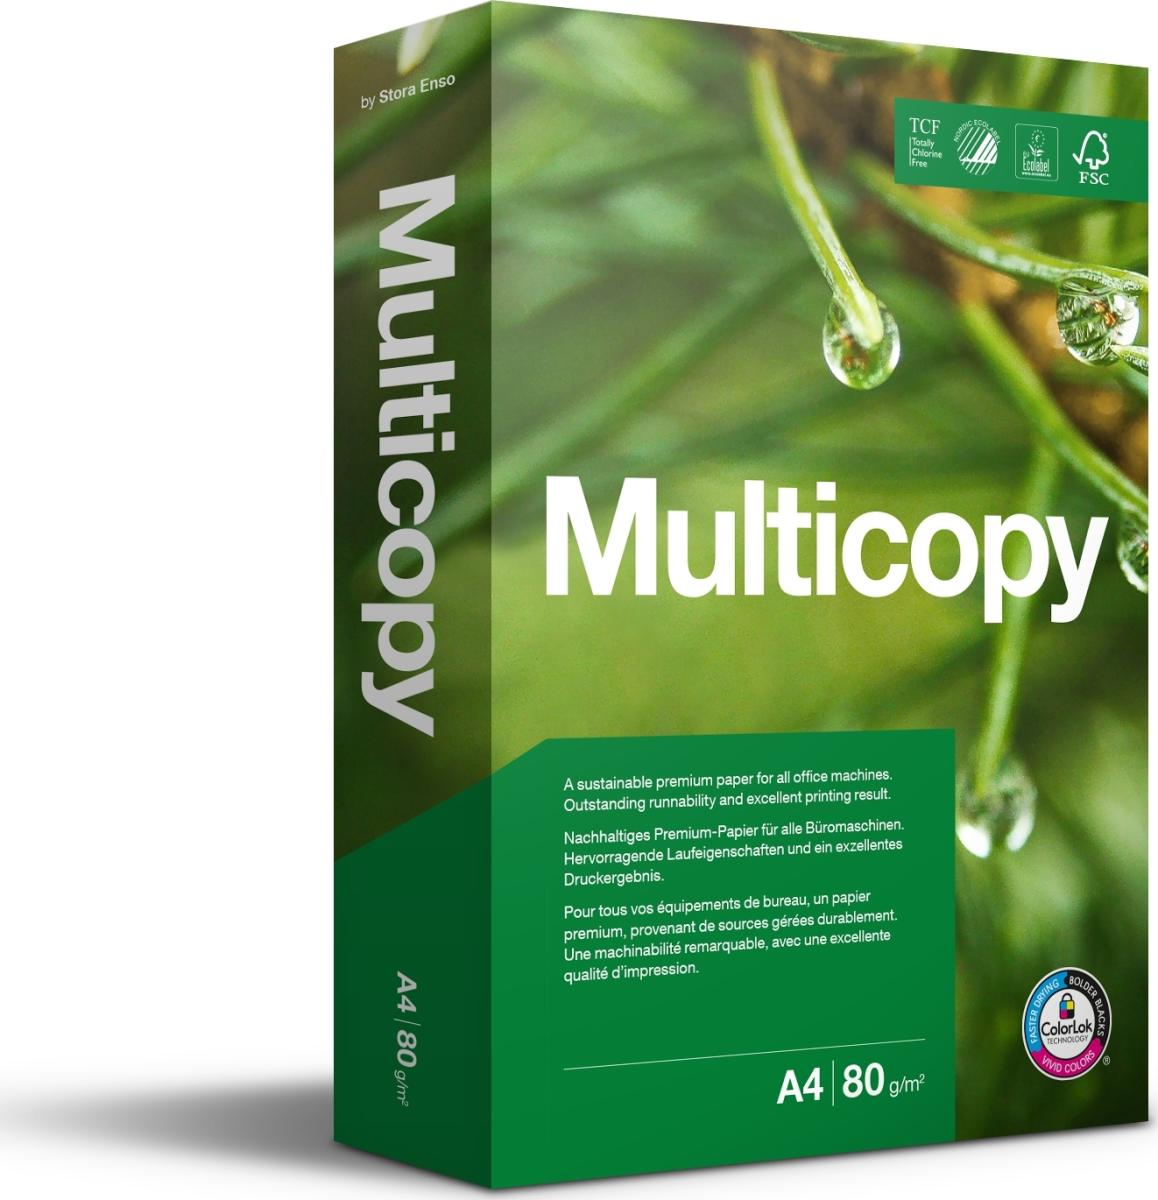 MultiCopy kopipapir A4/80g/500 ark - køb papir her ... Multicopy